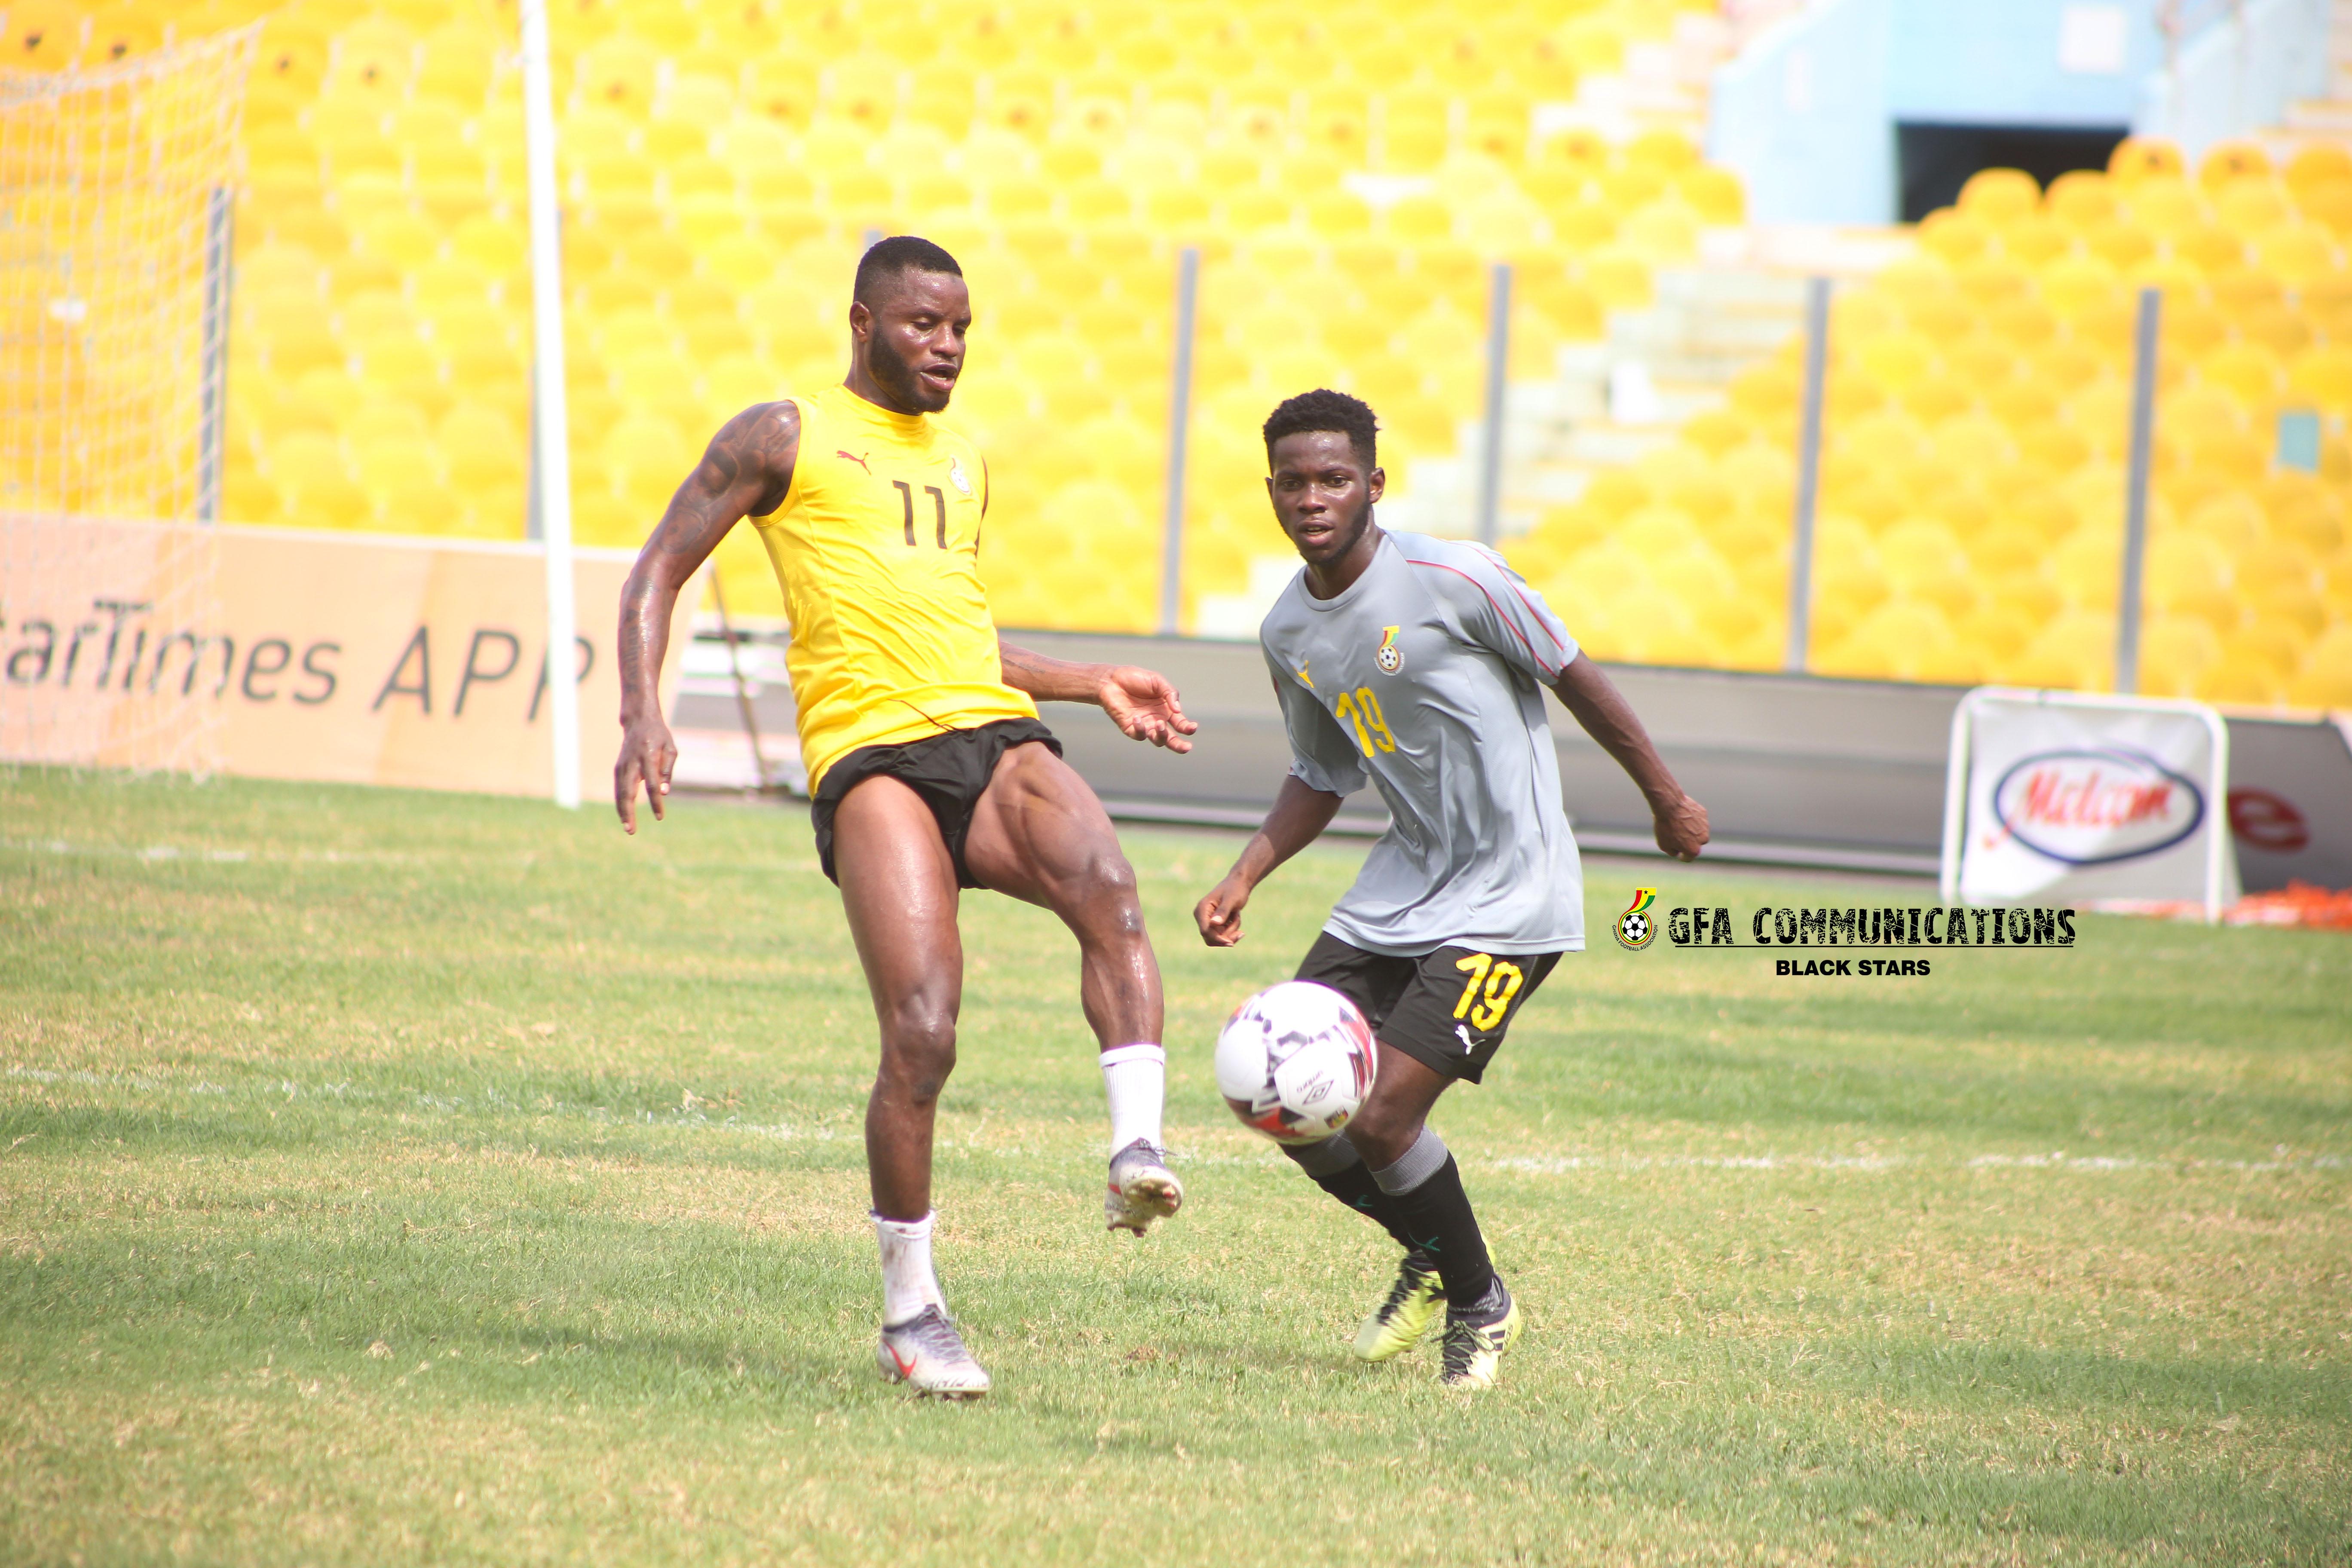 Black Stars break camp today, will return after GPL match day 17